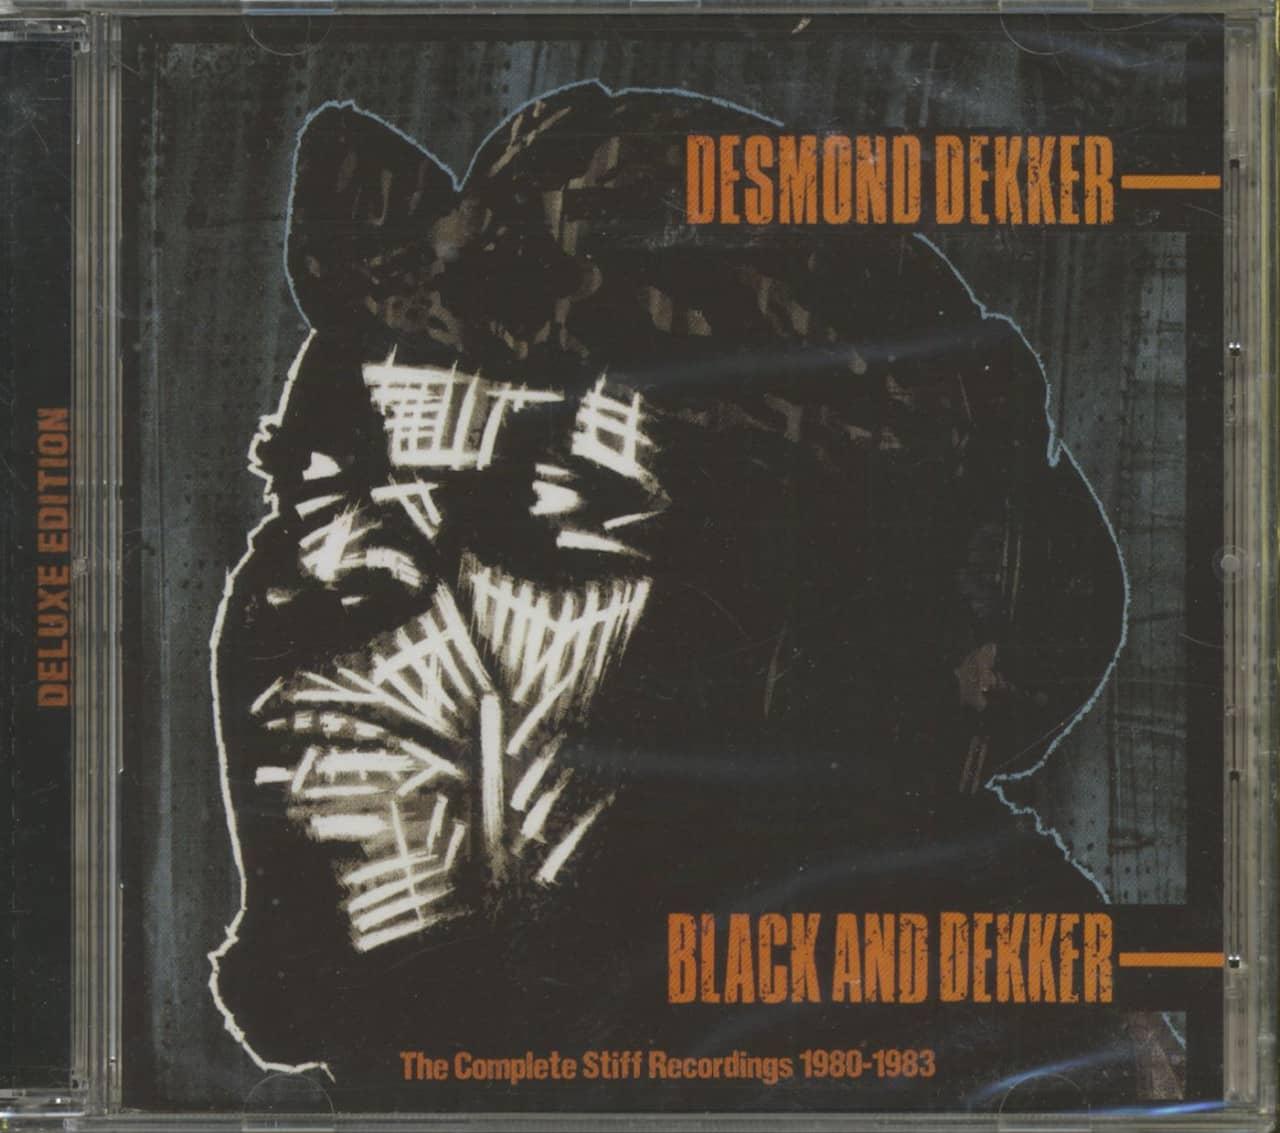 Desmond Dekker - Black And Dekker - The Complete Stiff Recordings (CD)